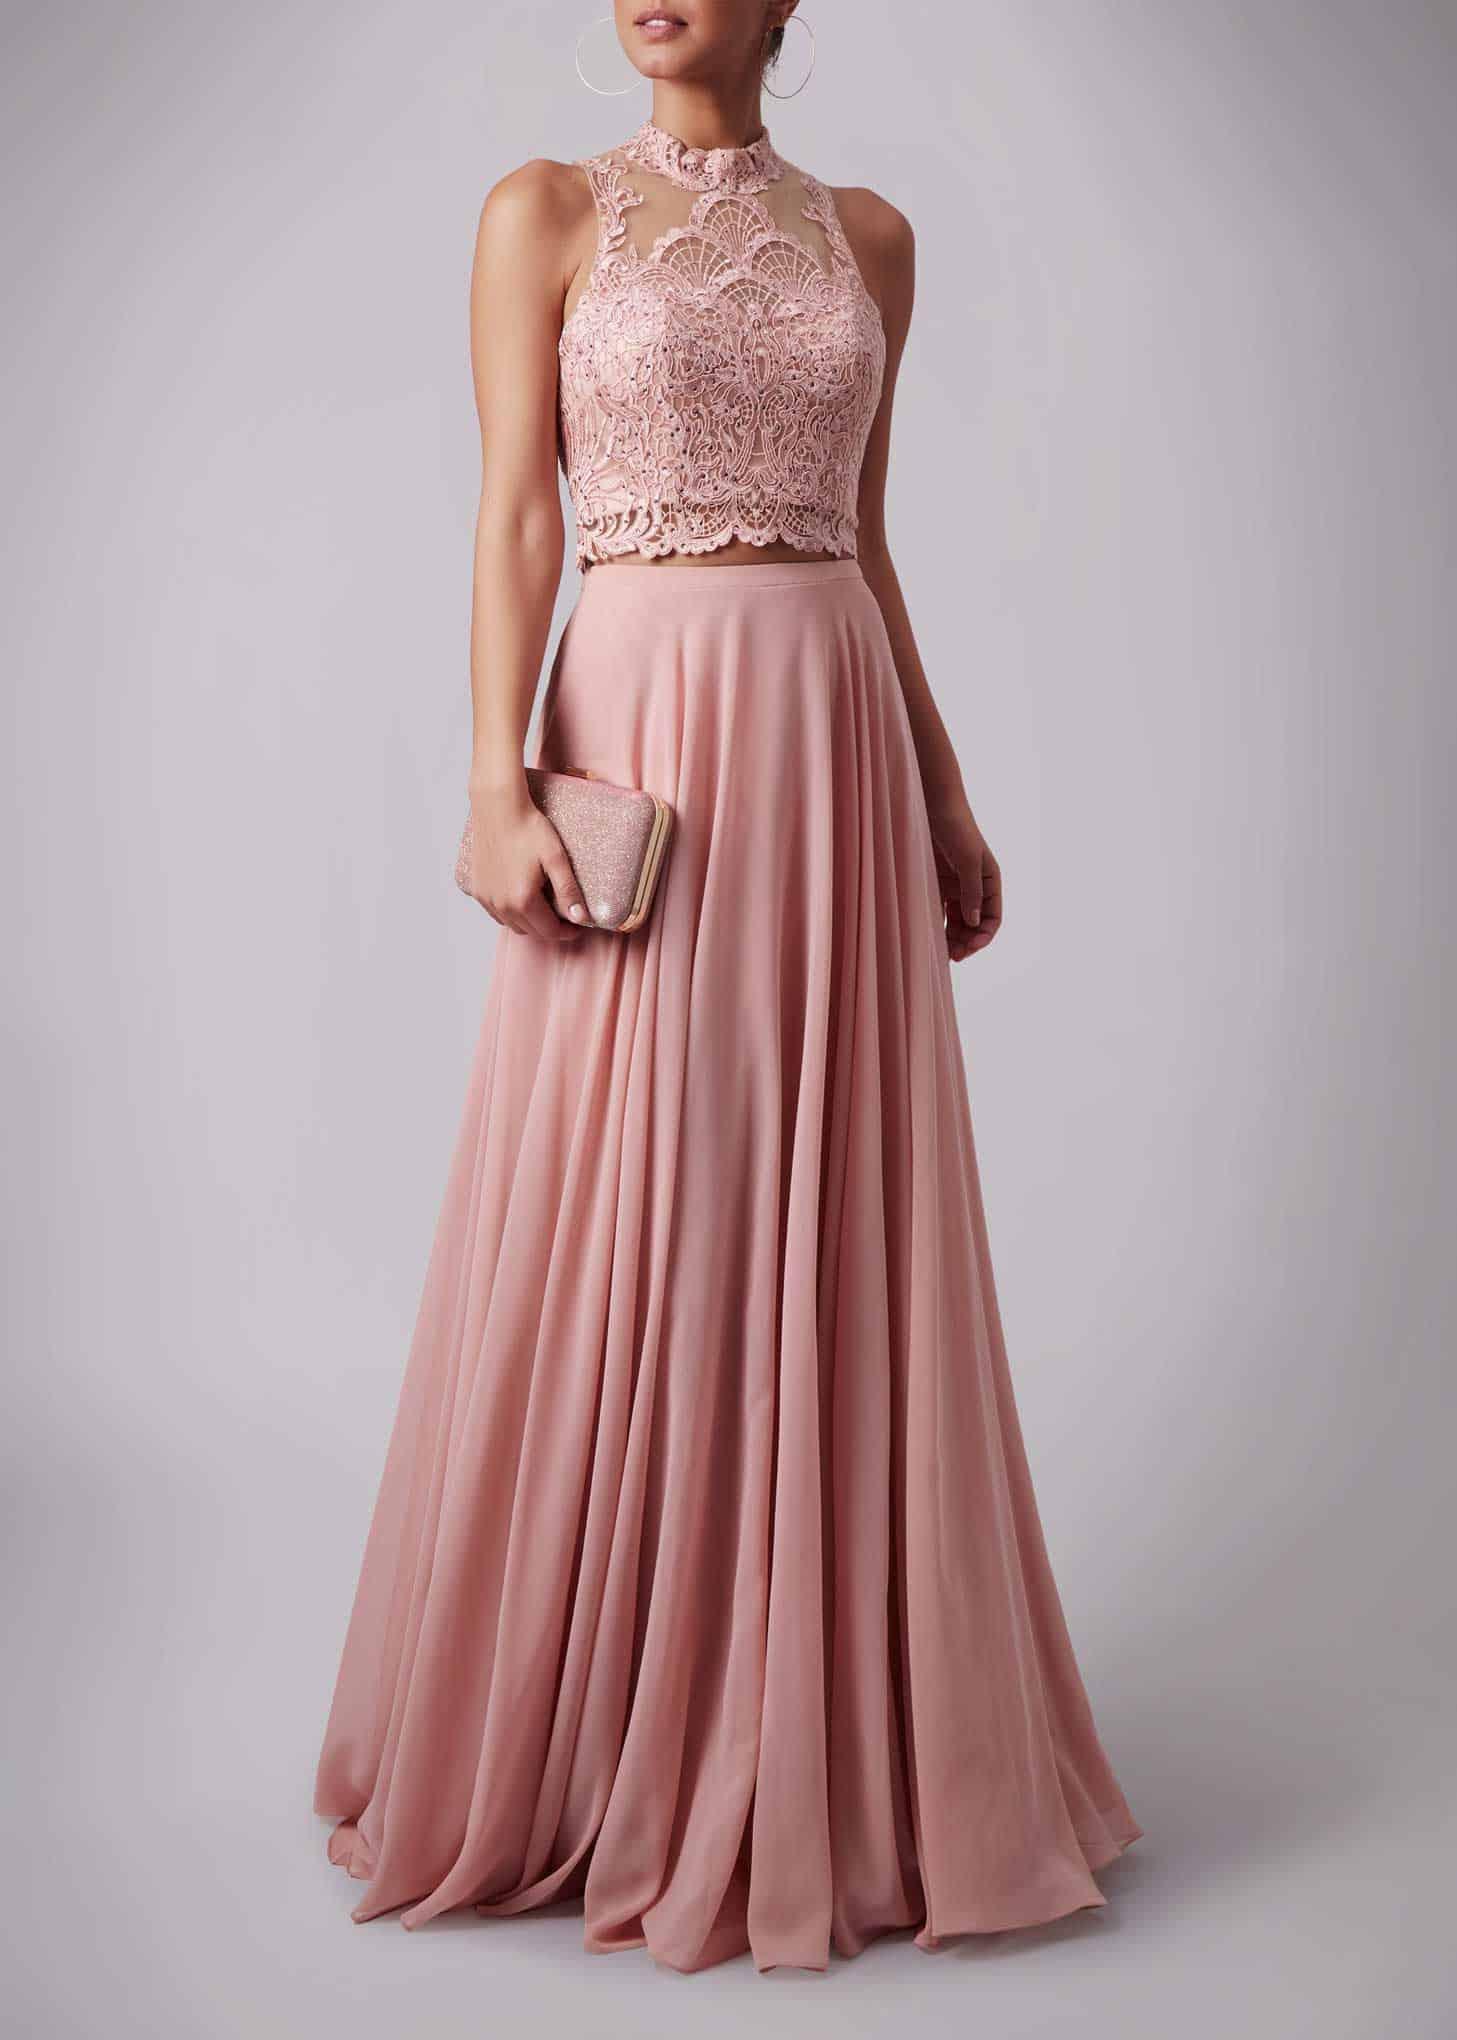 17 Wunderbar Rose Abend Kleid Design17 Wunderbar Rose Abend Kleid Stylish